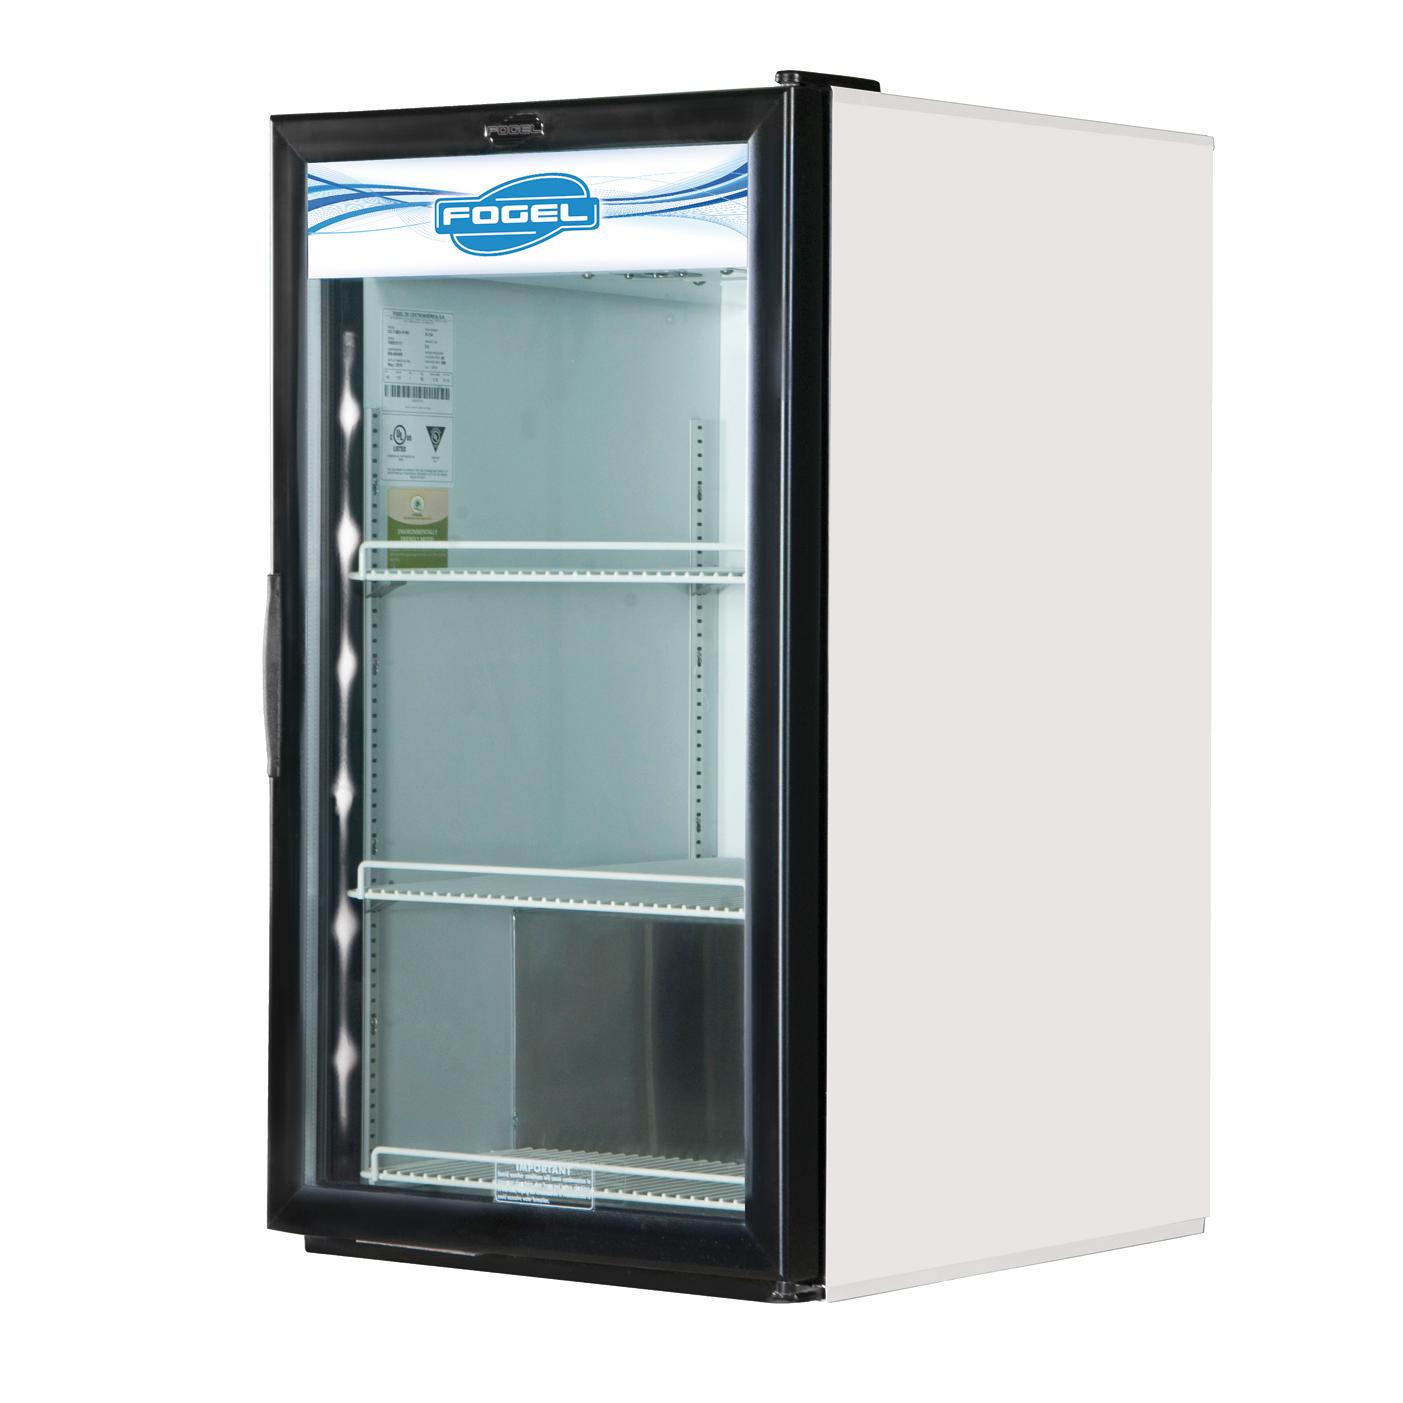 Fogel USA CC-7-HC refrigerator, merchandiser, countertop